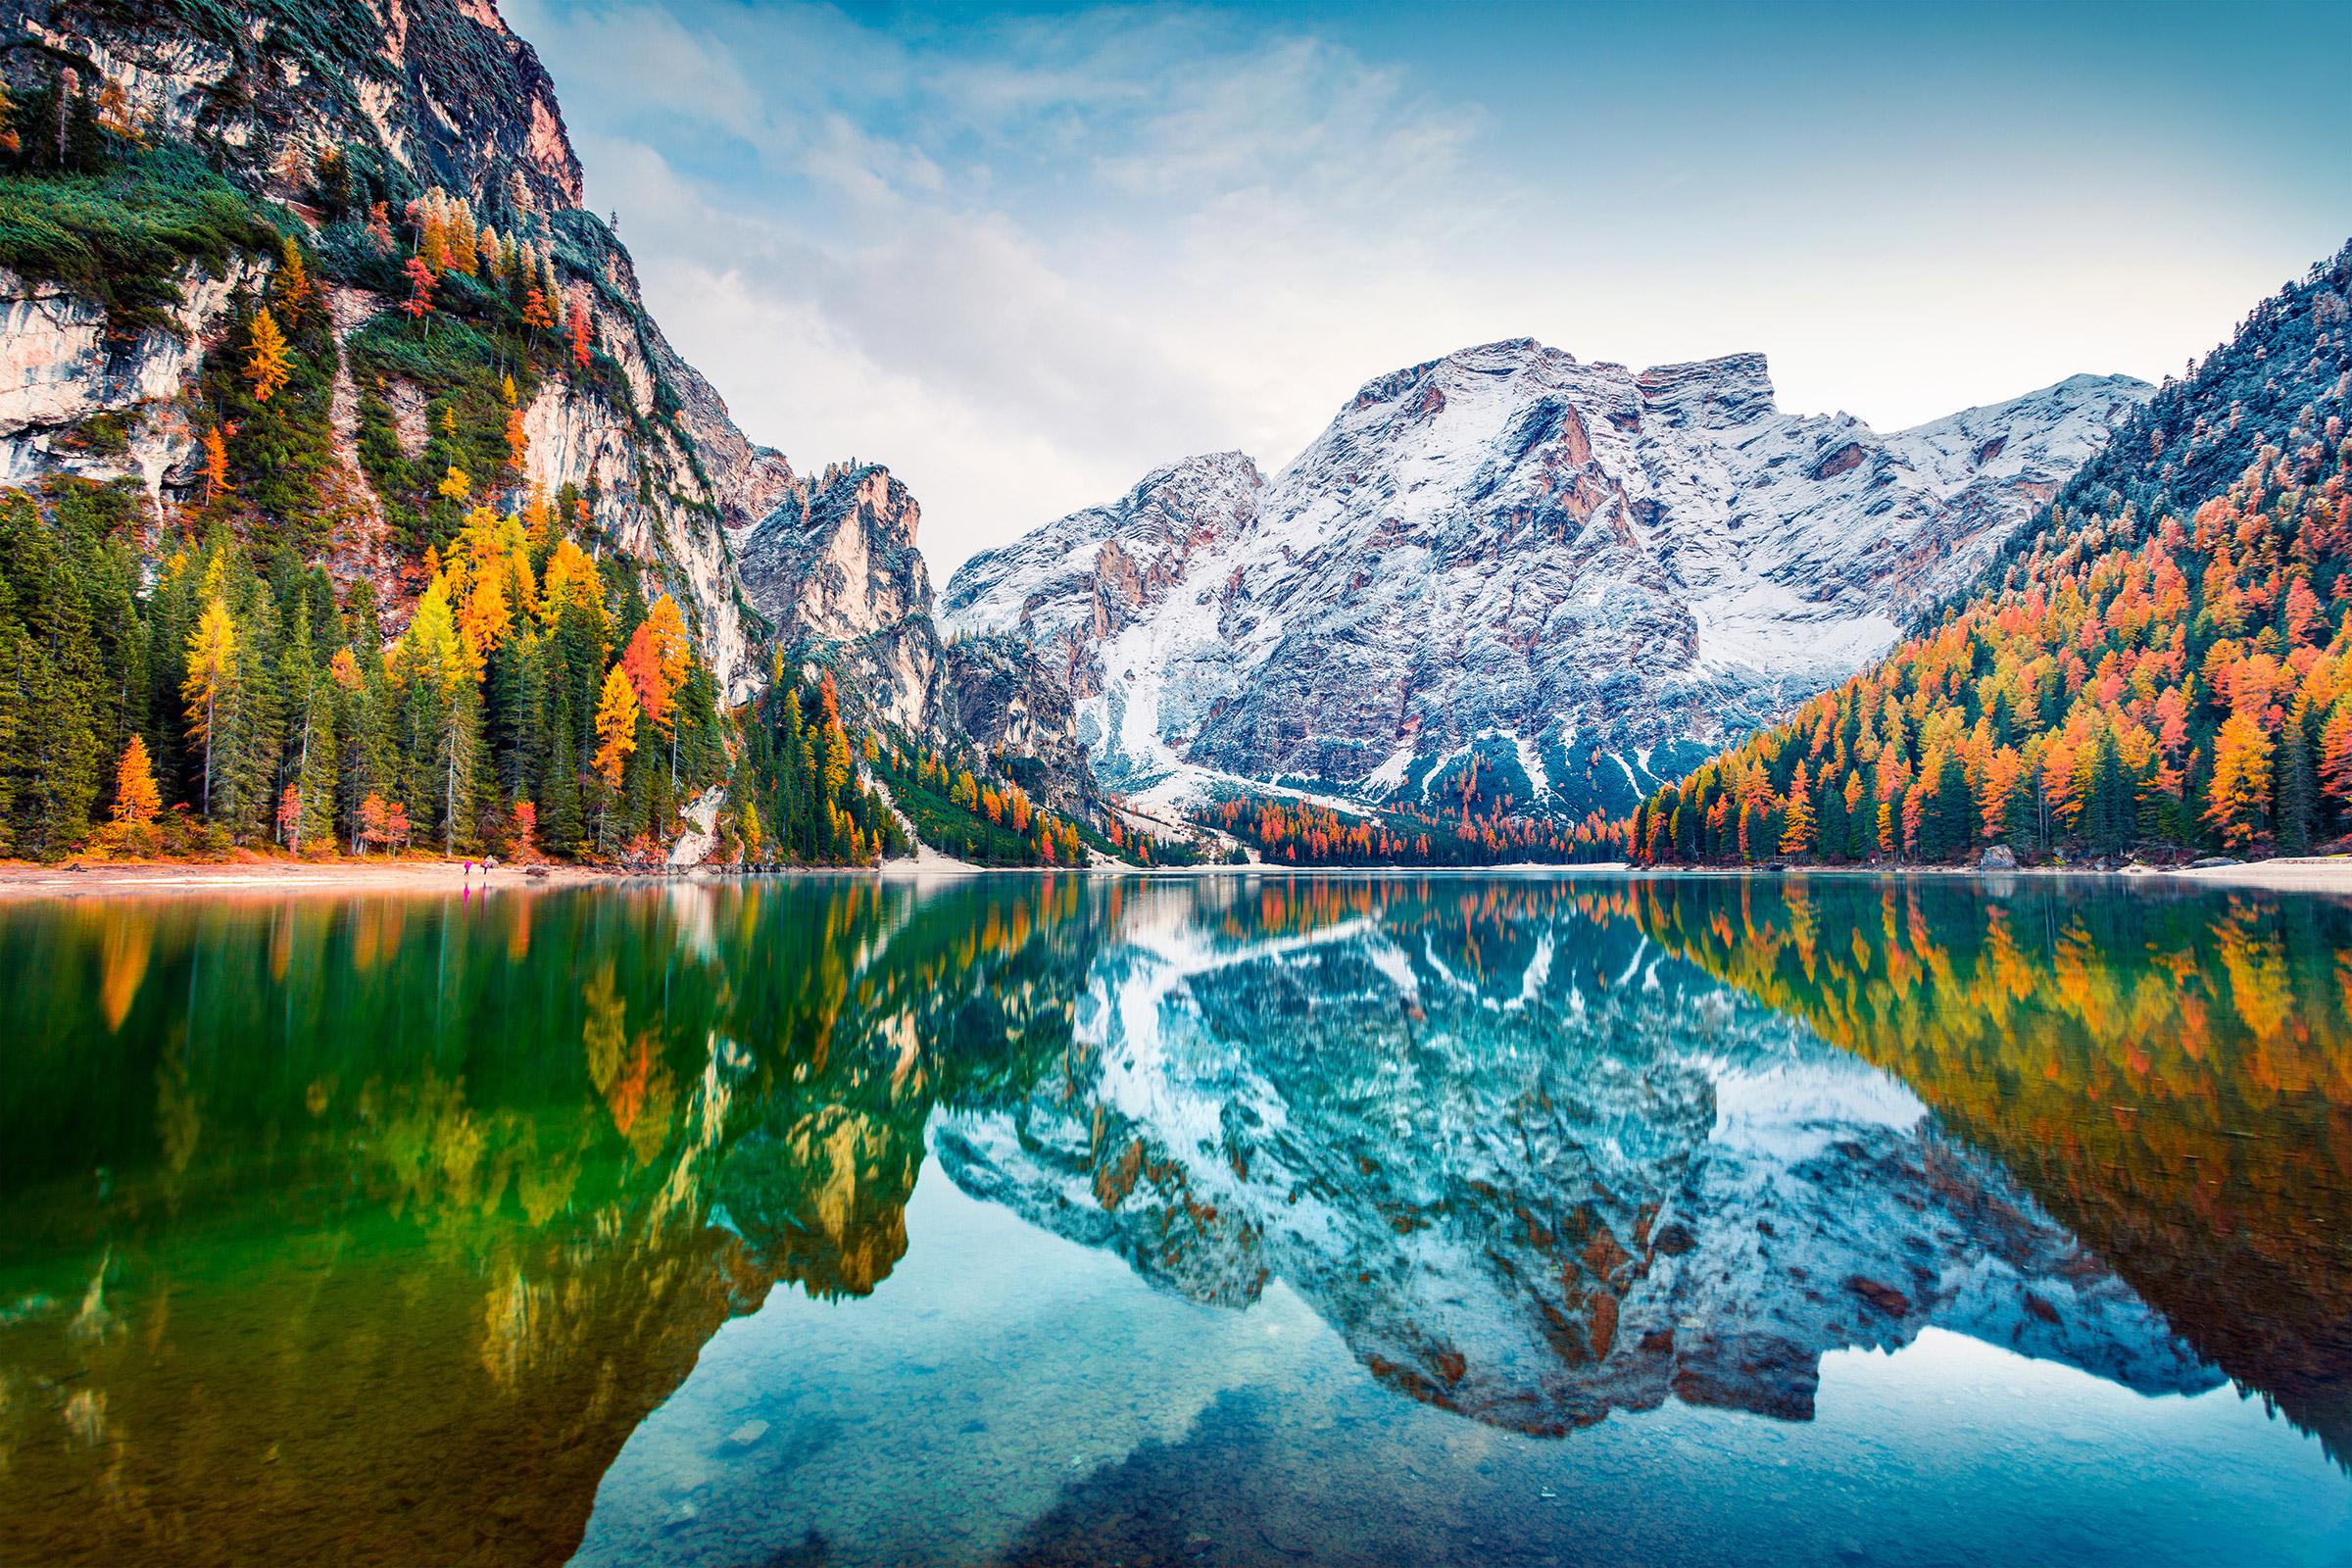 Italy Dolomites Fanes-Sennes-Prags Nature Park